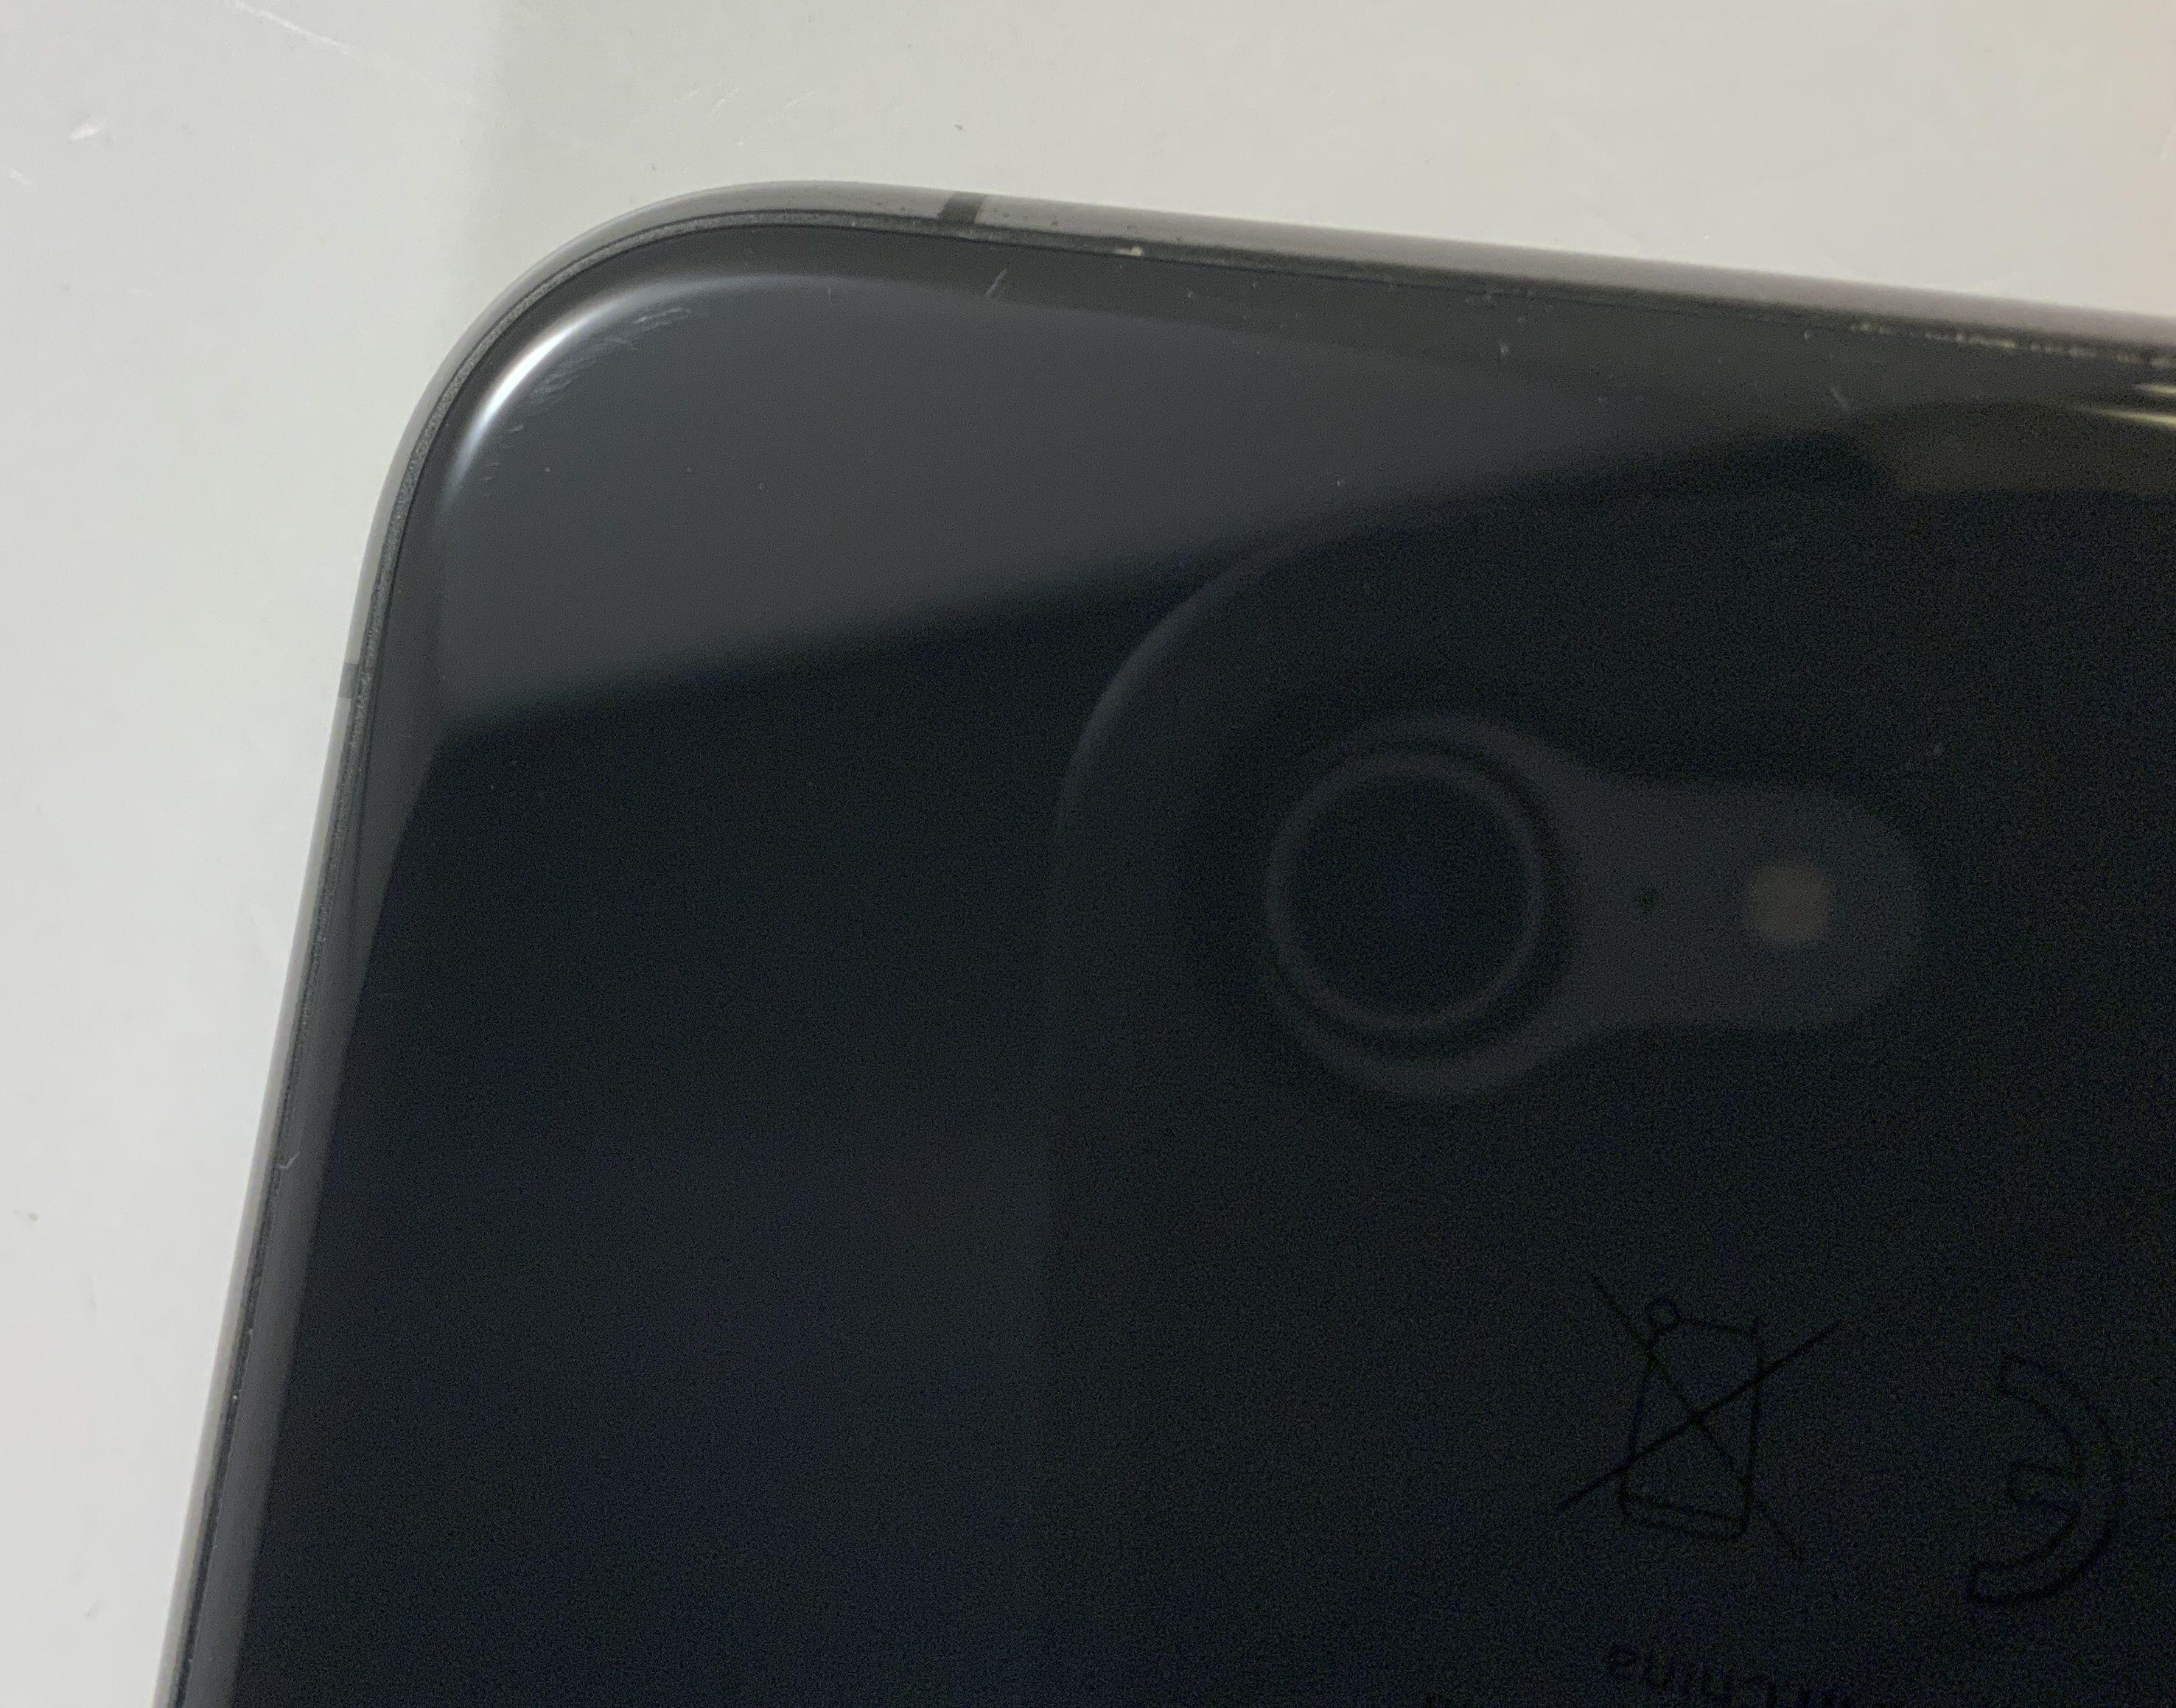 iPhone XS Max 512GB, 512GB, Space Gray, Bild 3